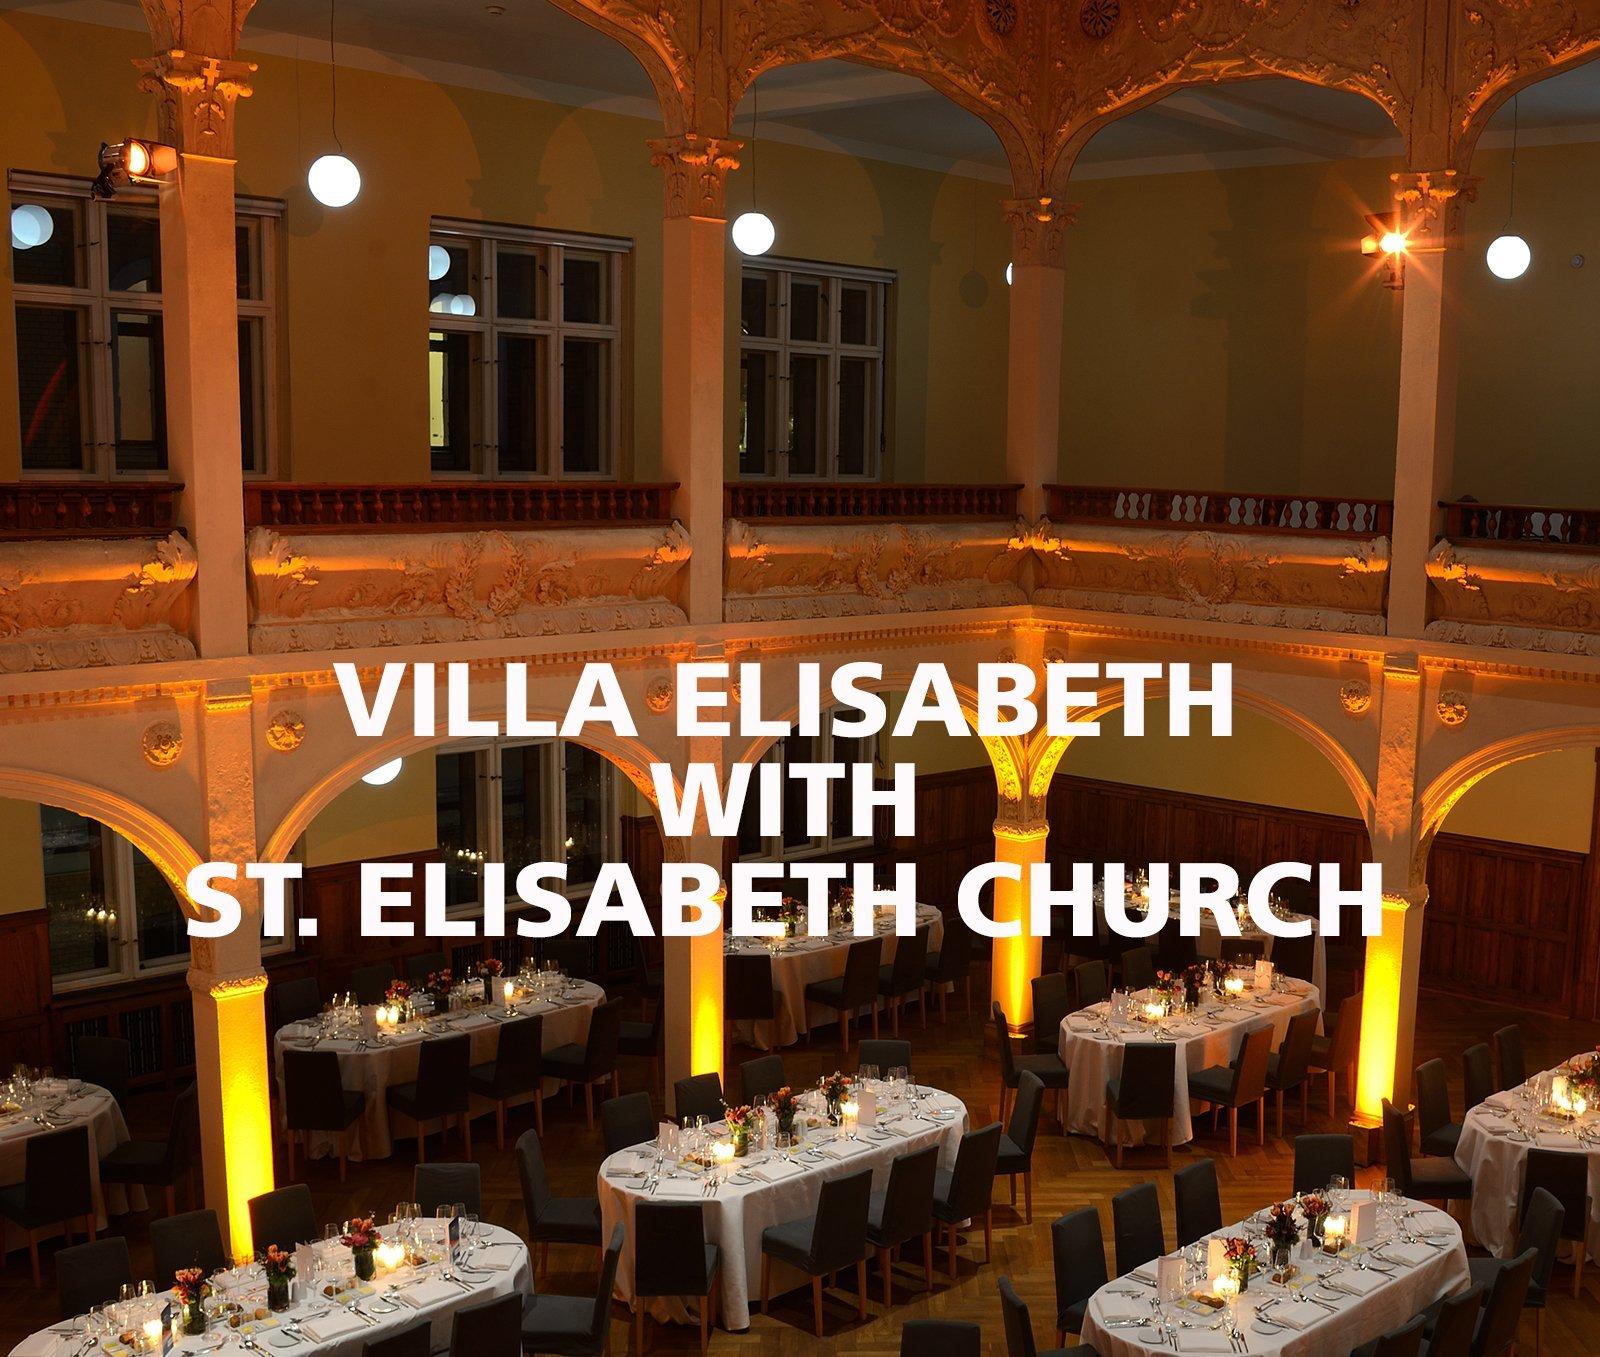 FLORIS Partner Location Villa Elisabeth with Church